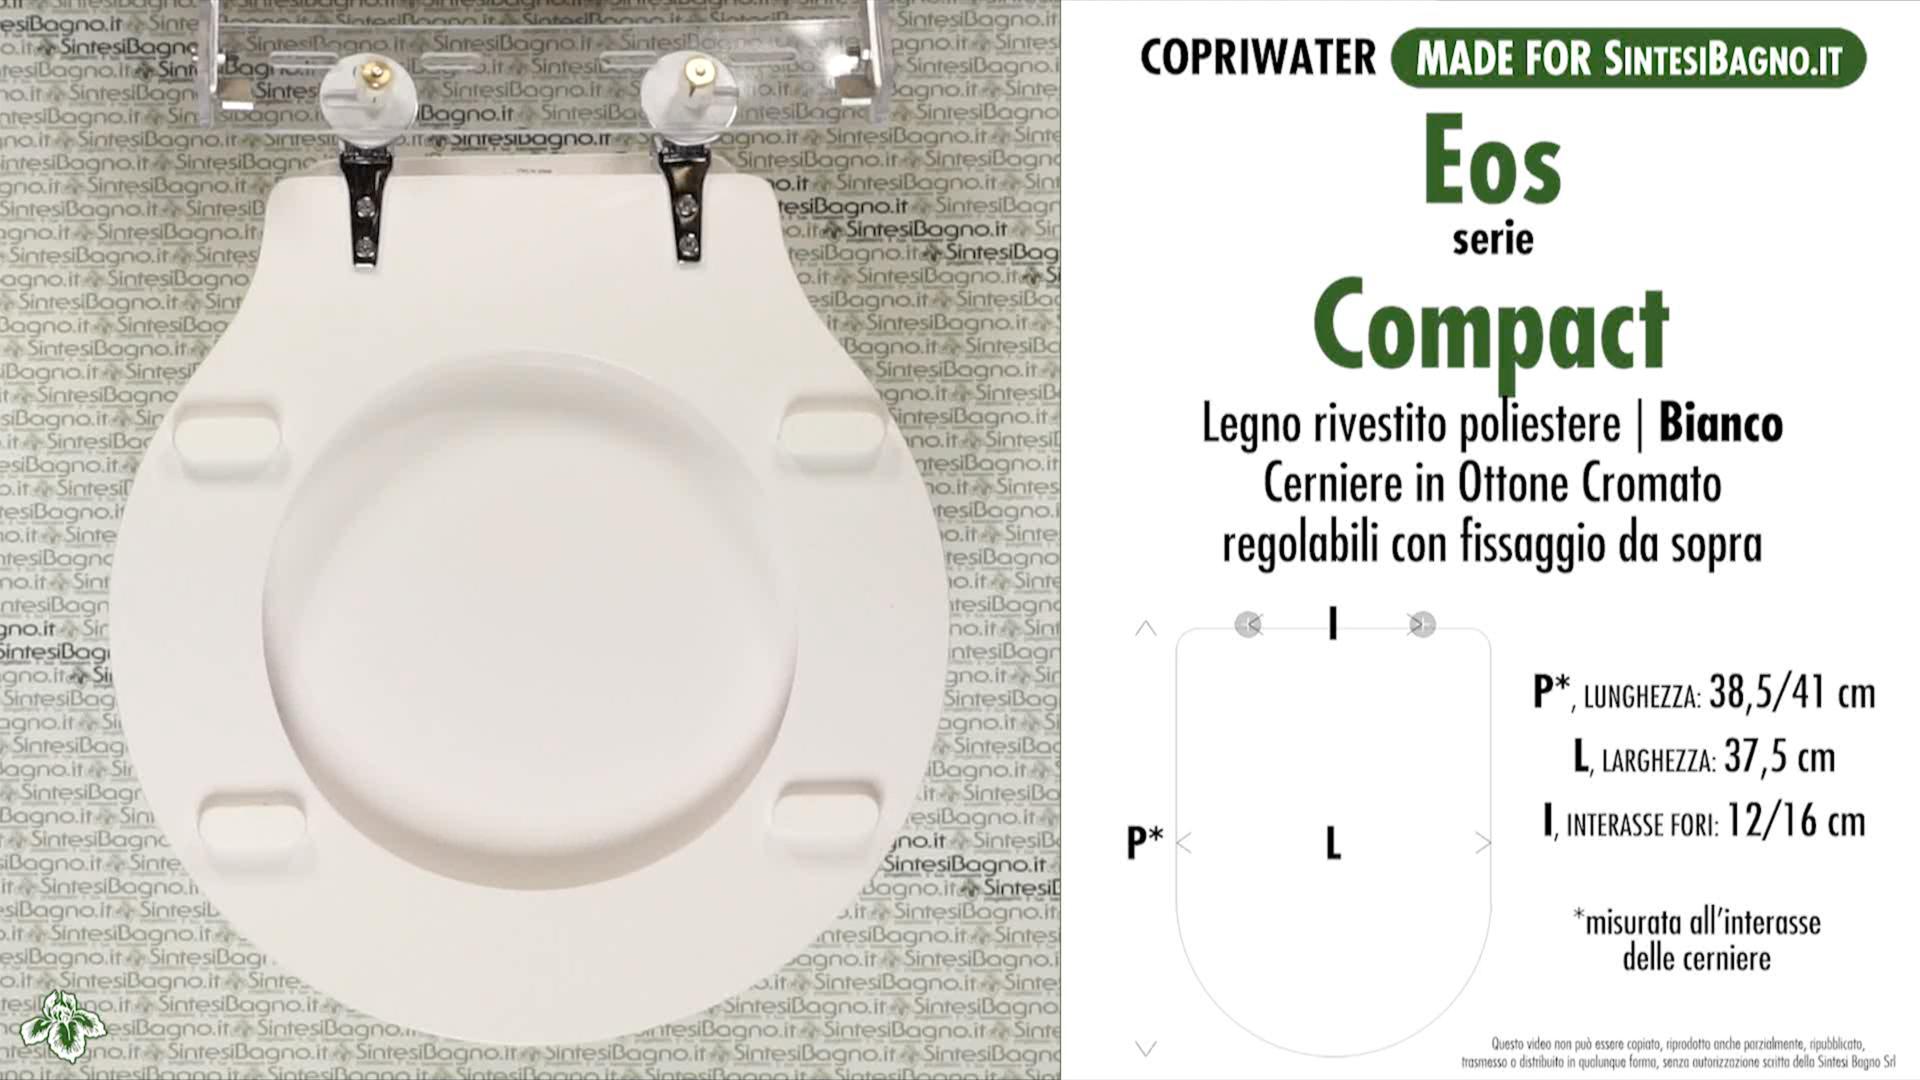 SCHEDA TECNICA MISURE copriwater EOS COMPACT